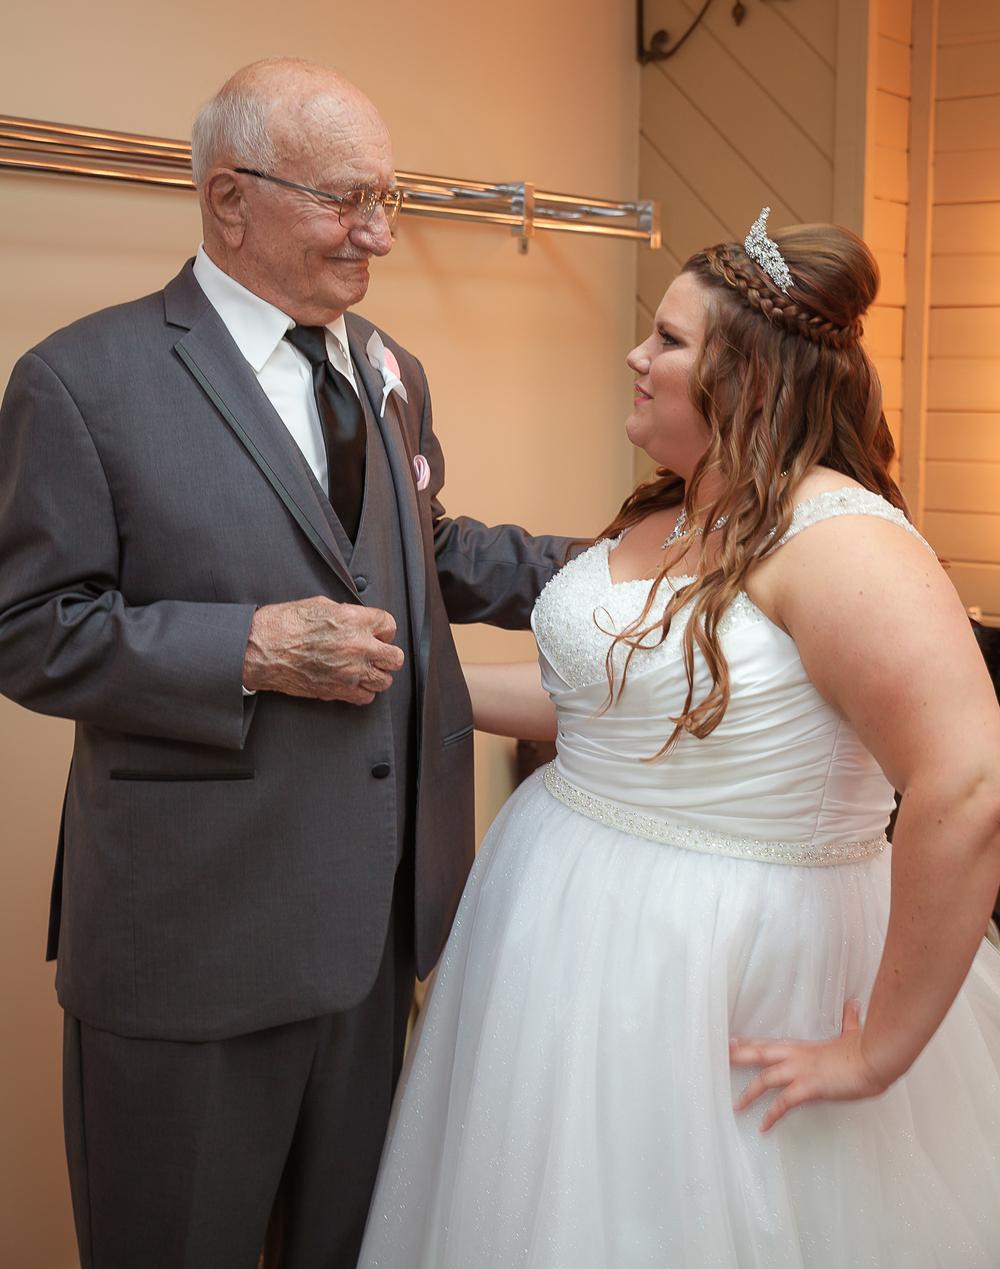 jenna + tony wedding blog (30 of 112).jpg